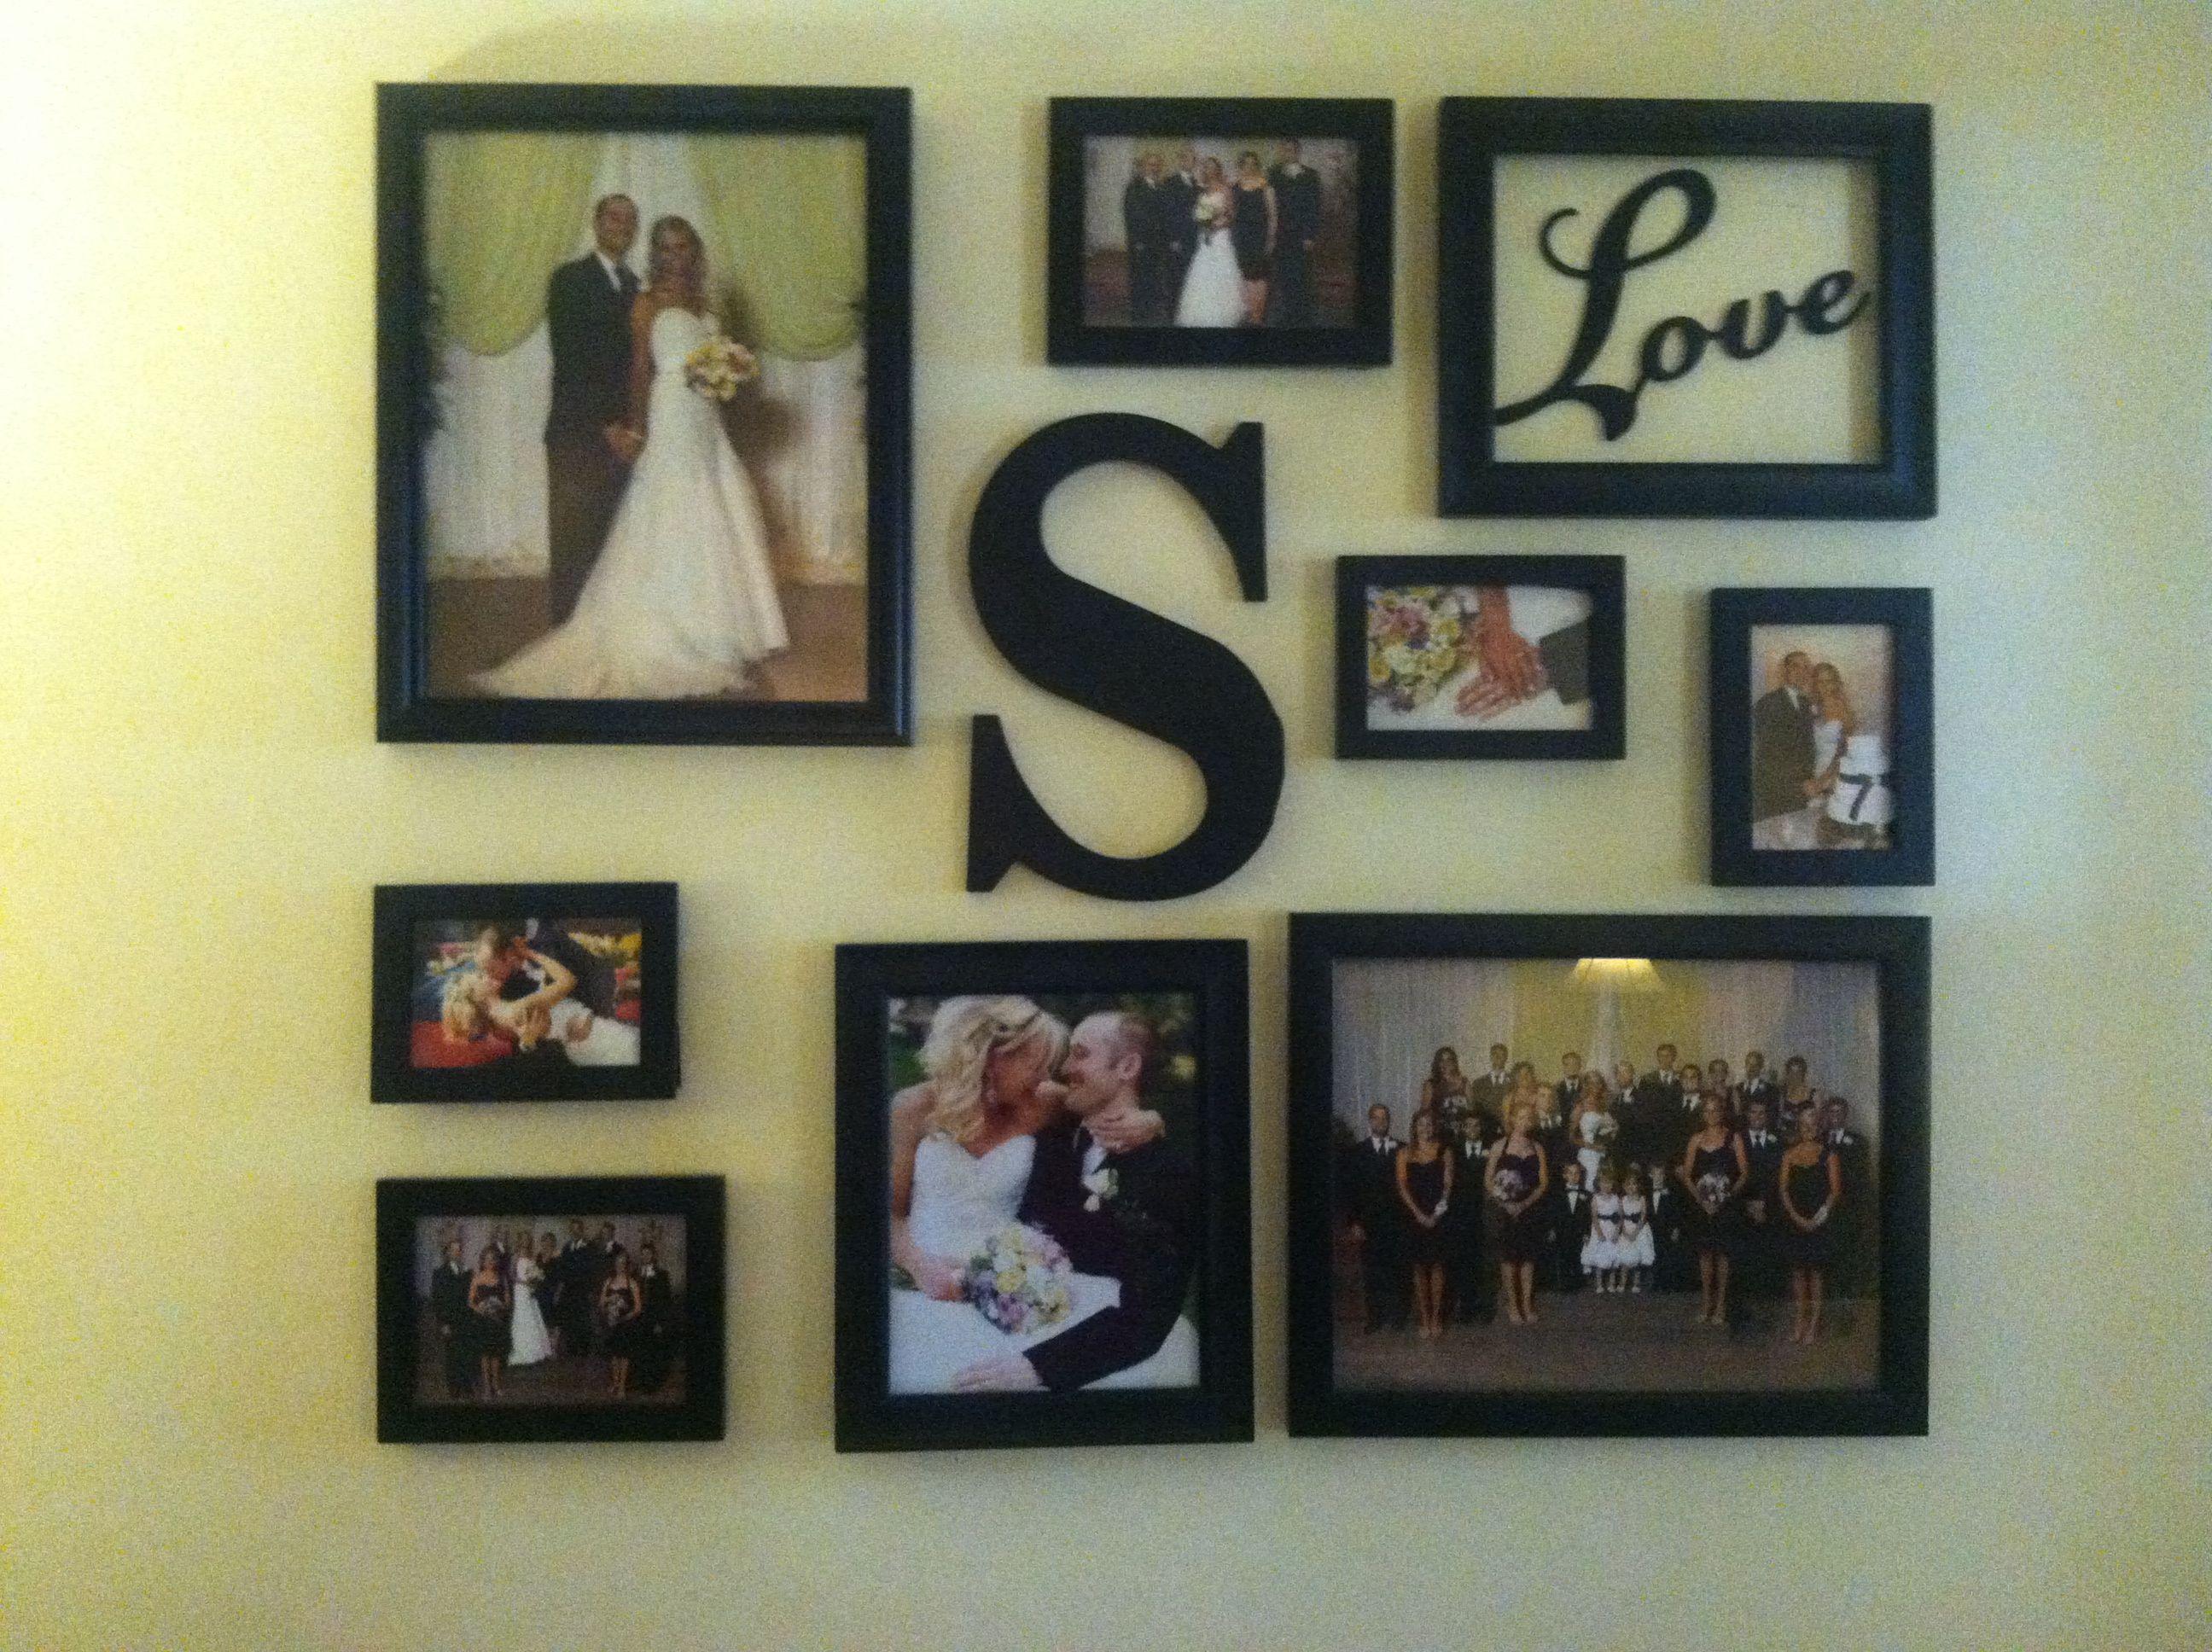 Wedding Collage Cheri Edwards Bergman